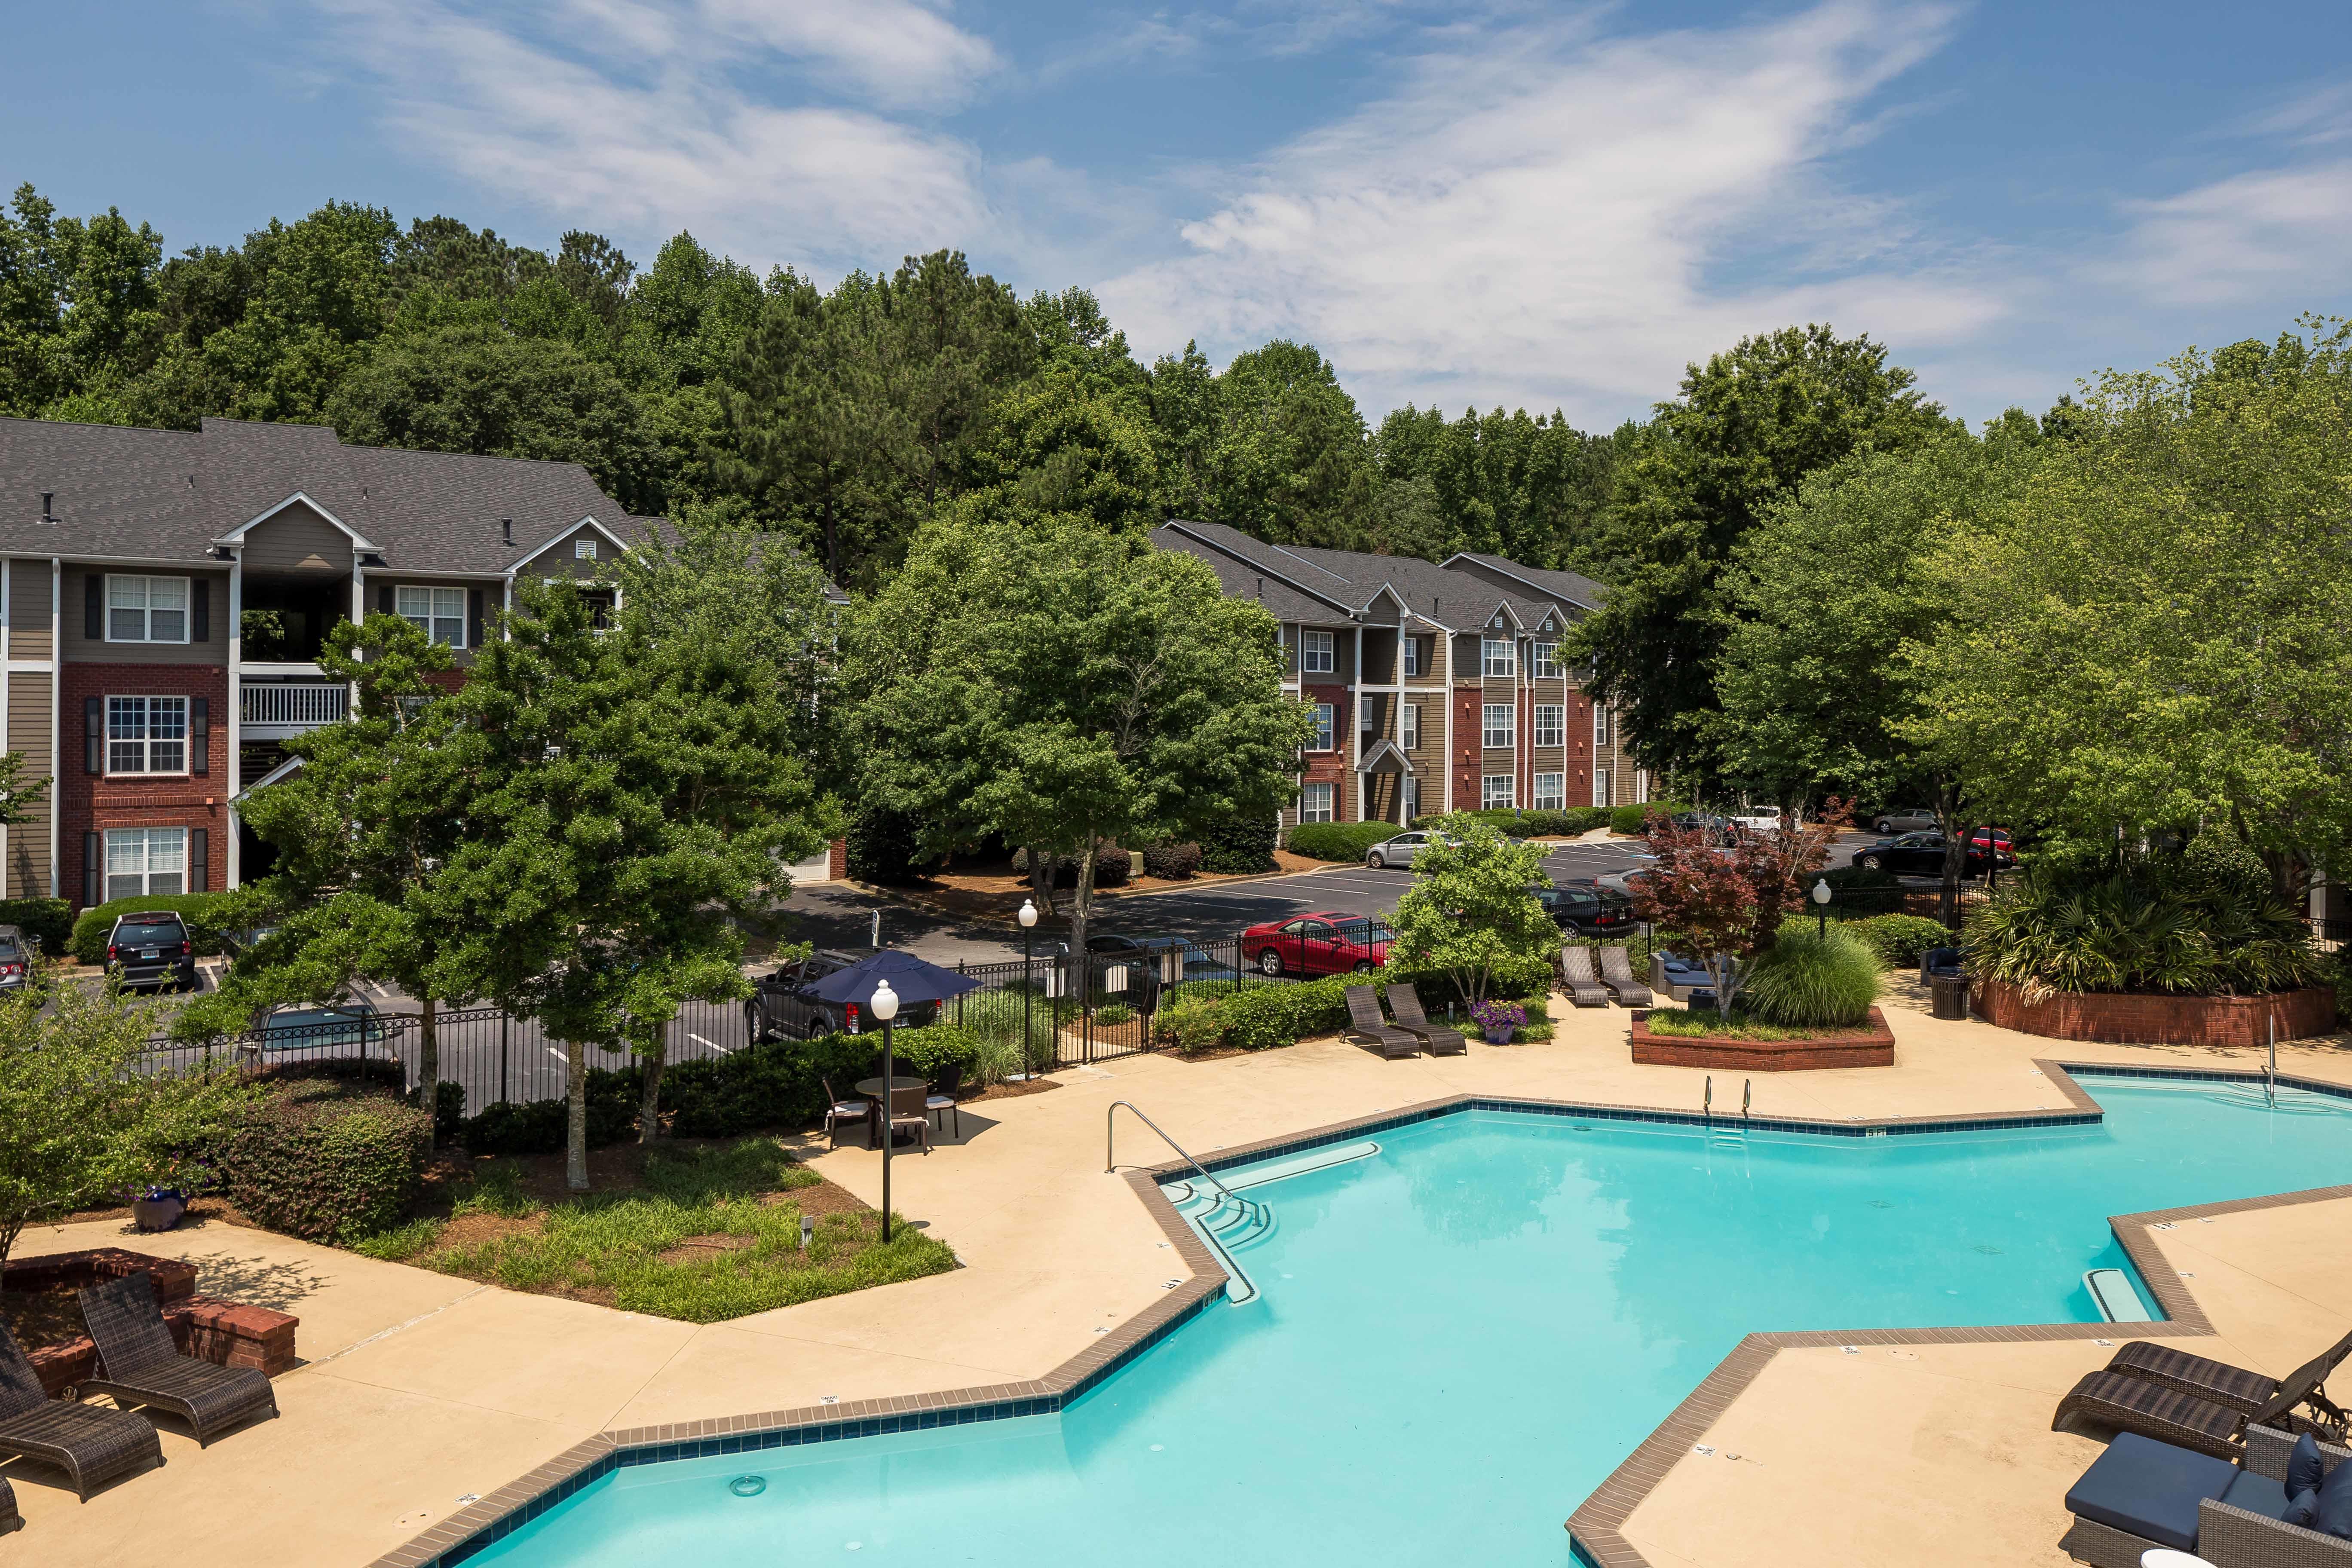 The Retreat at River Park Apartments image 12